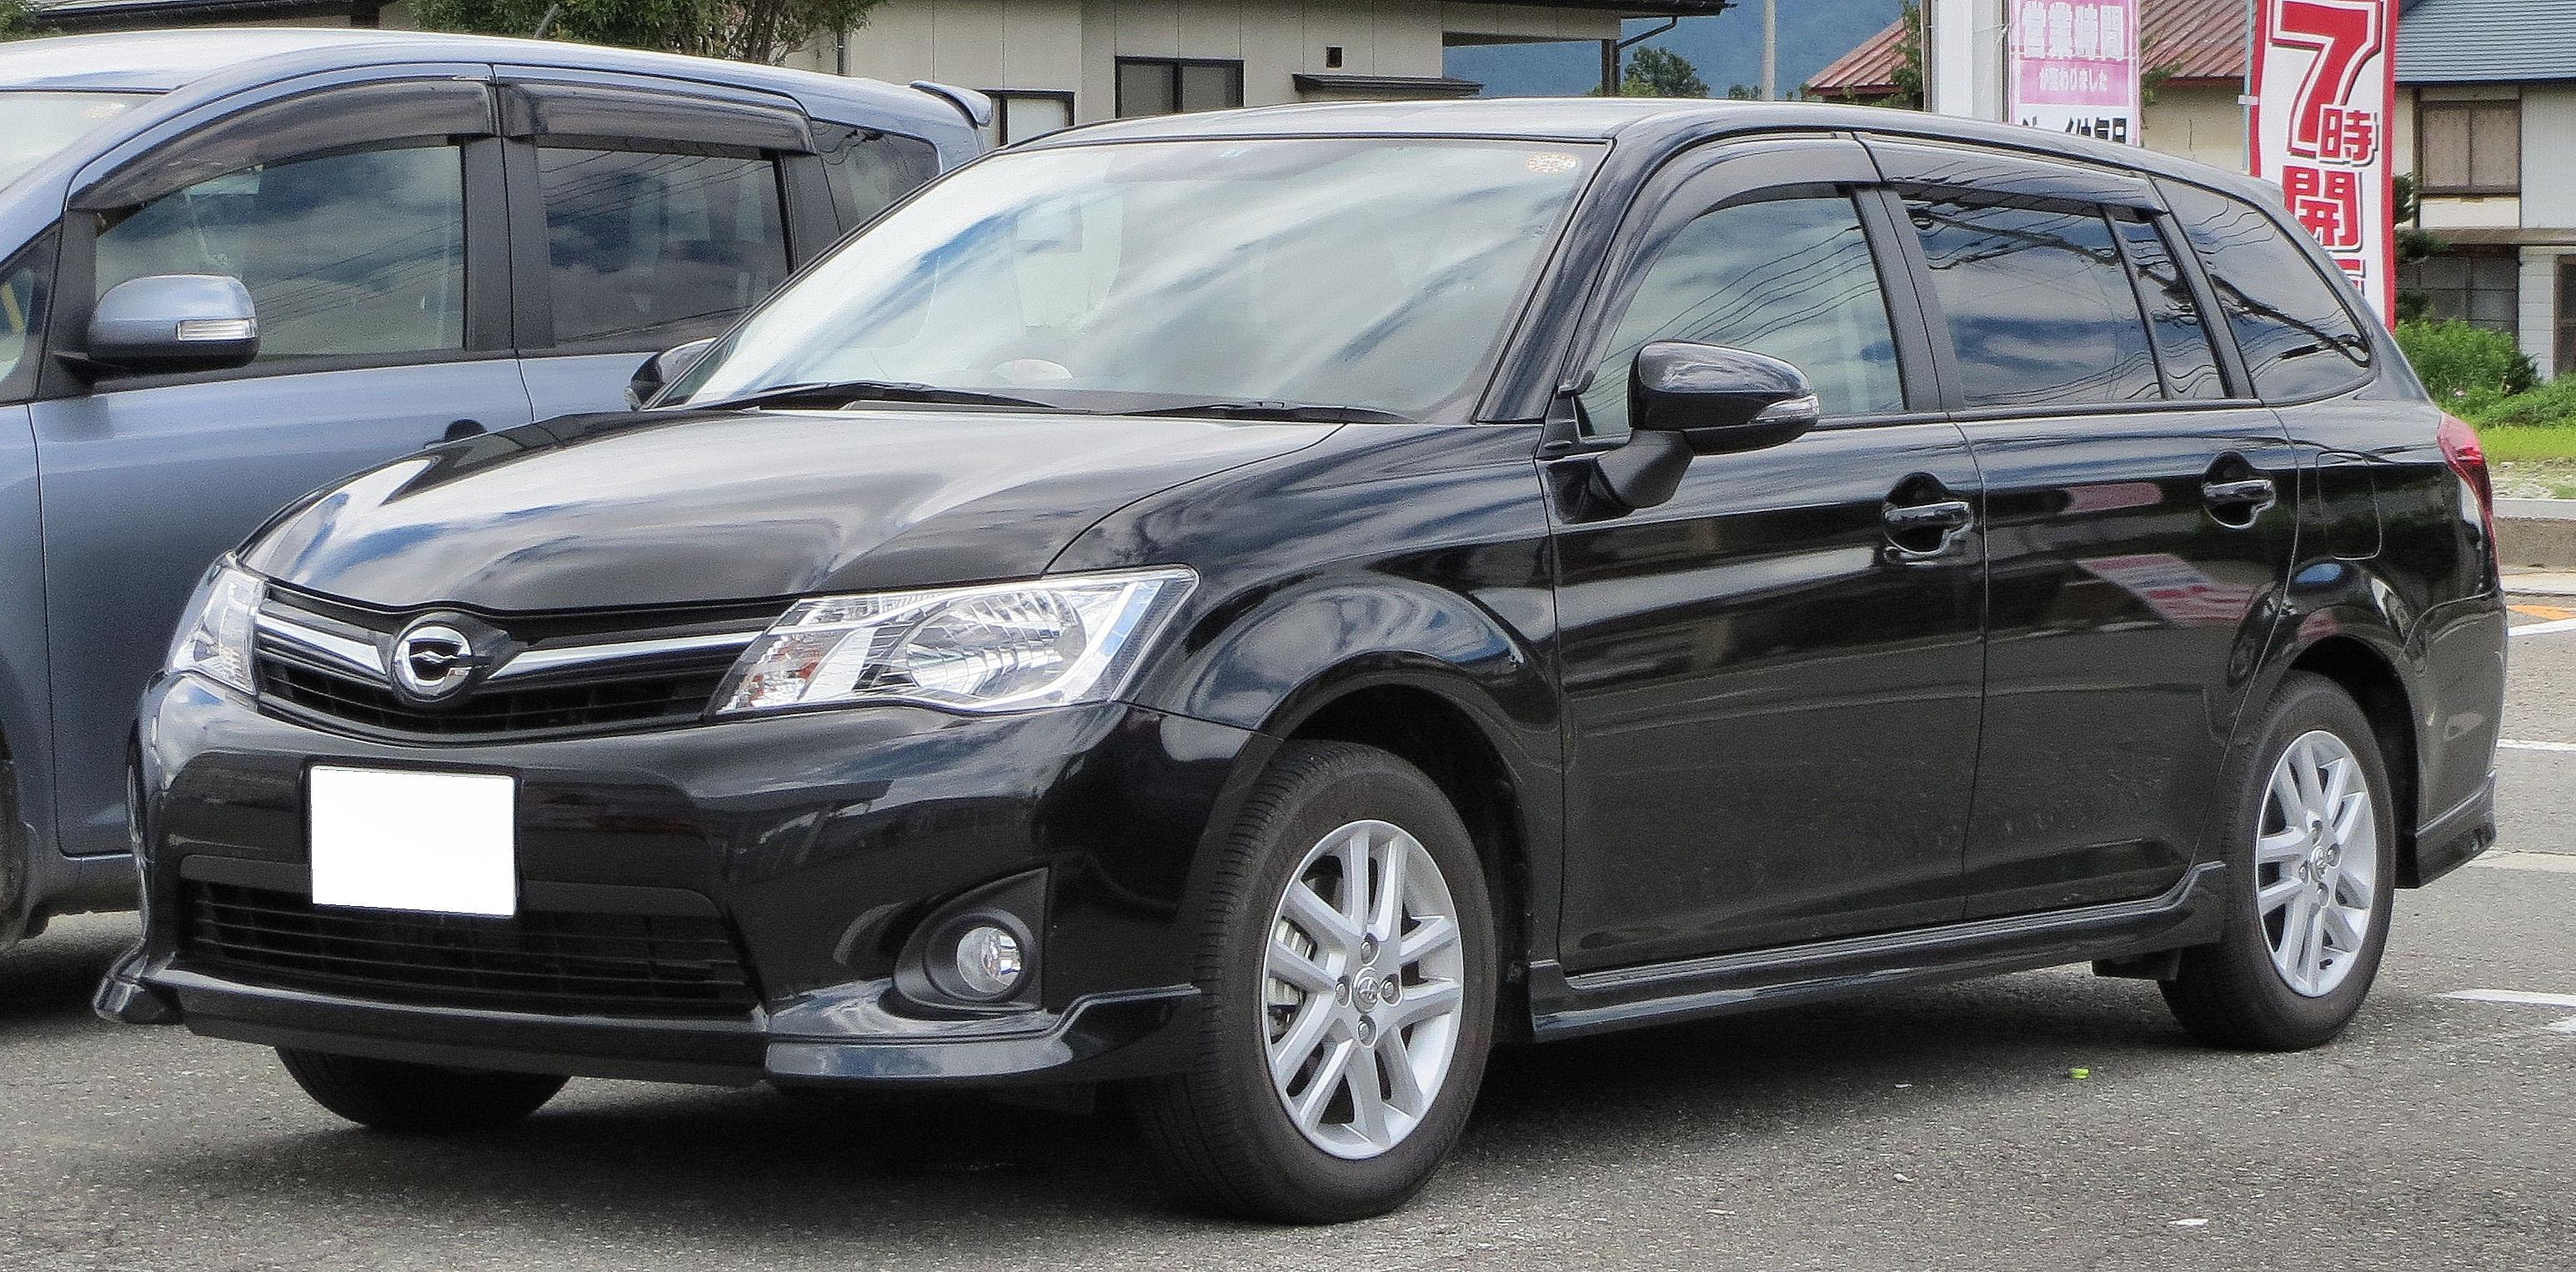 File:Toyota Corolla Fielder (NZE161G) 1.5G AeroTourer.JPG ...